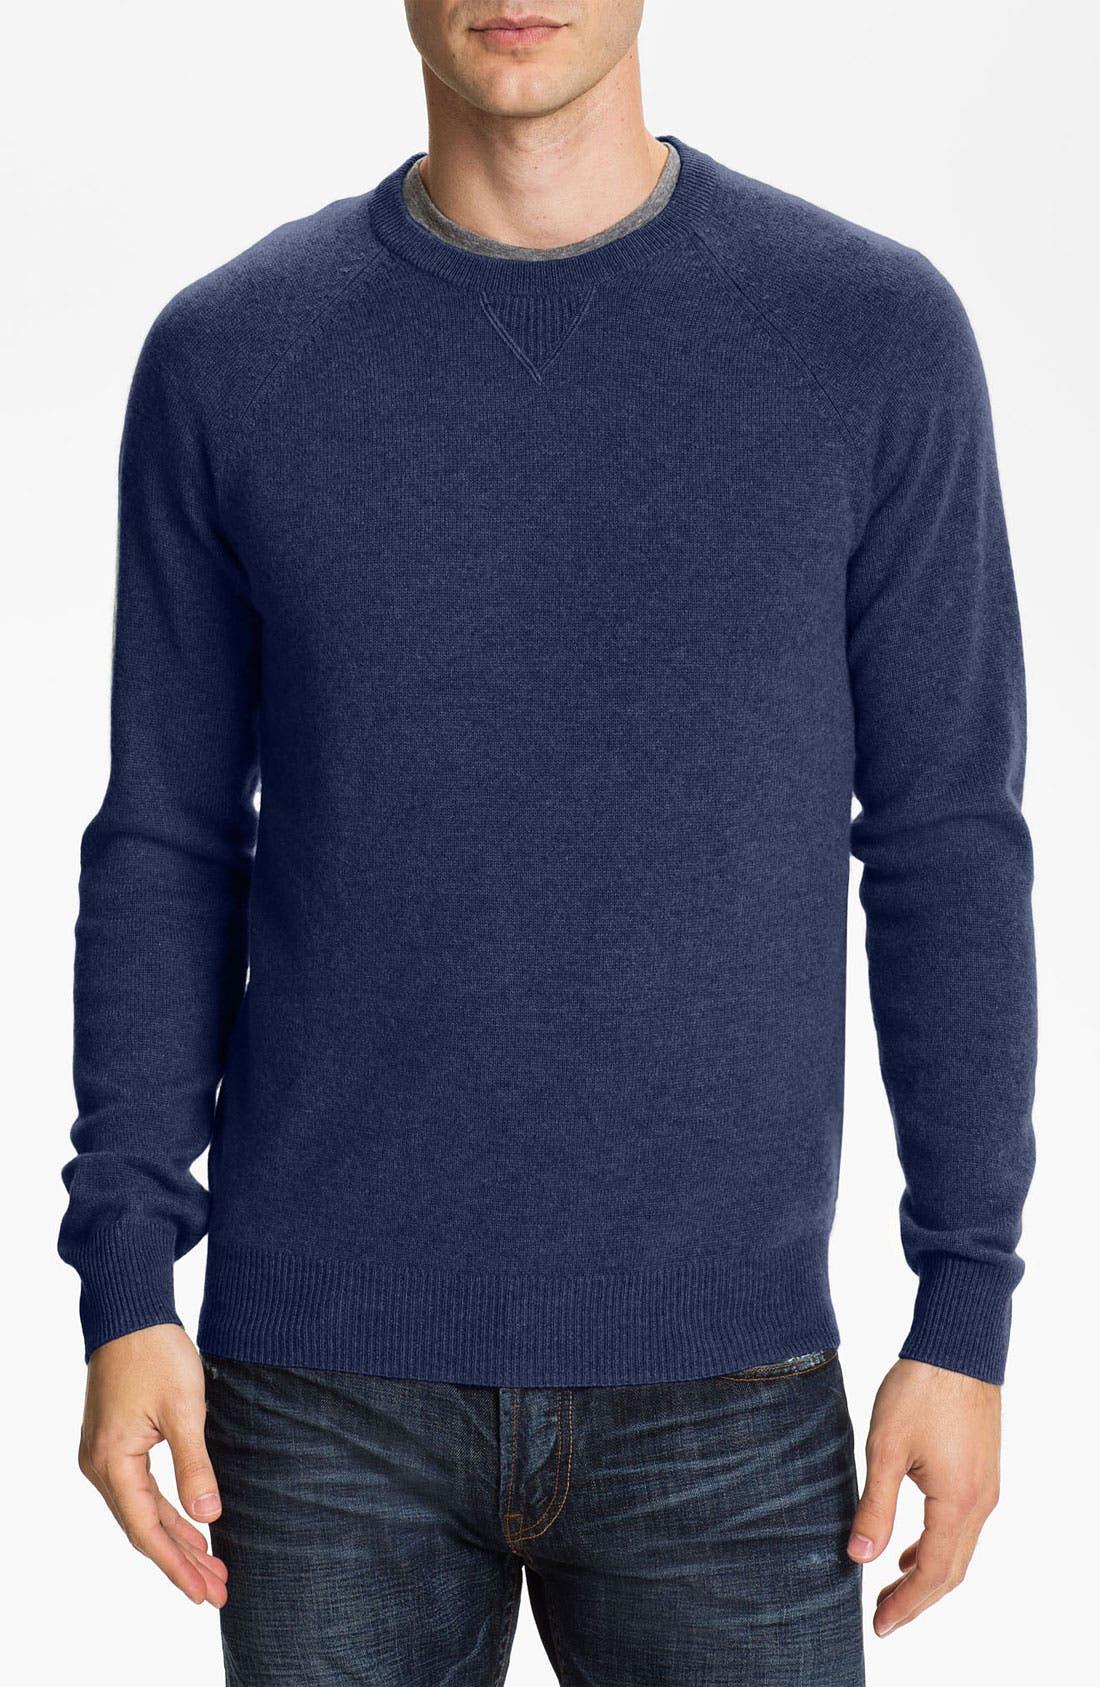 Main Image - 1901 Trim Fit Crewneck Cashmere Sweater